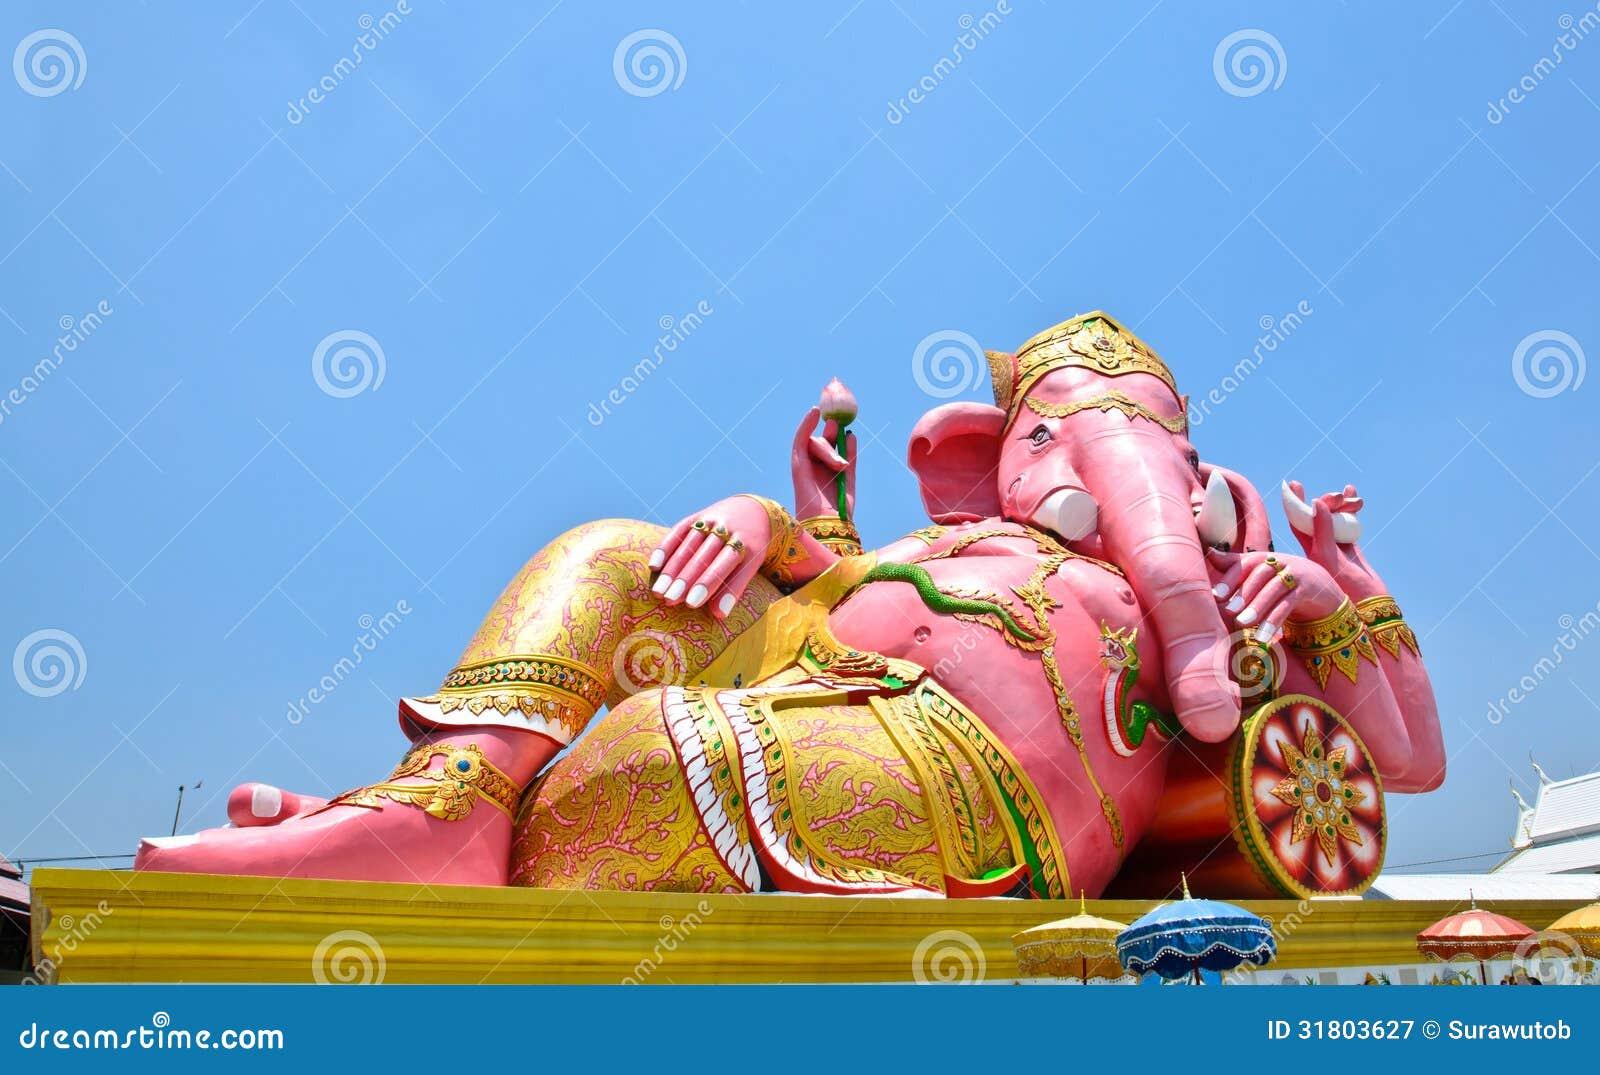 Big Pink Ganesha In Relax Pose Thailand Royalty Free